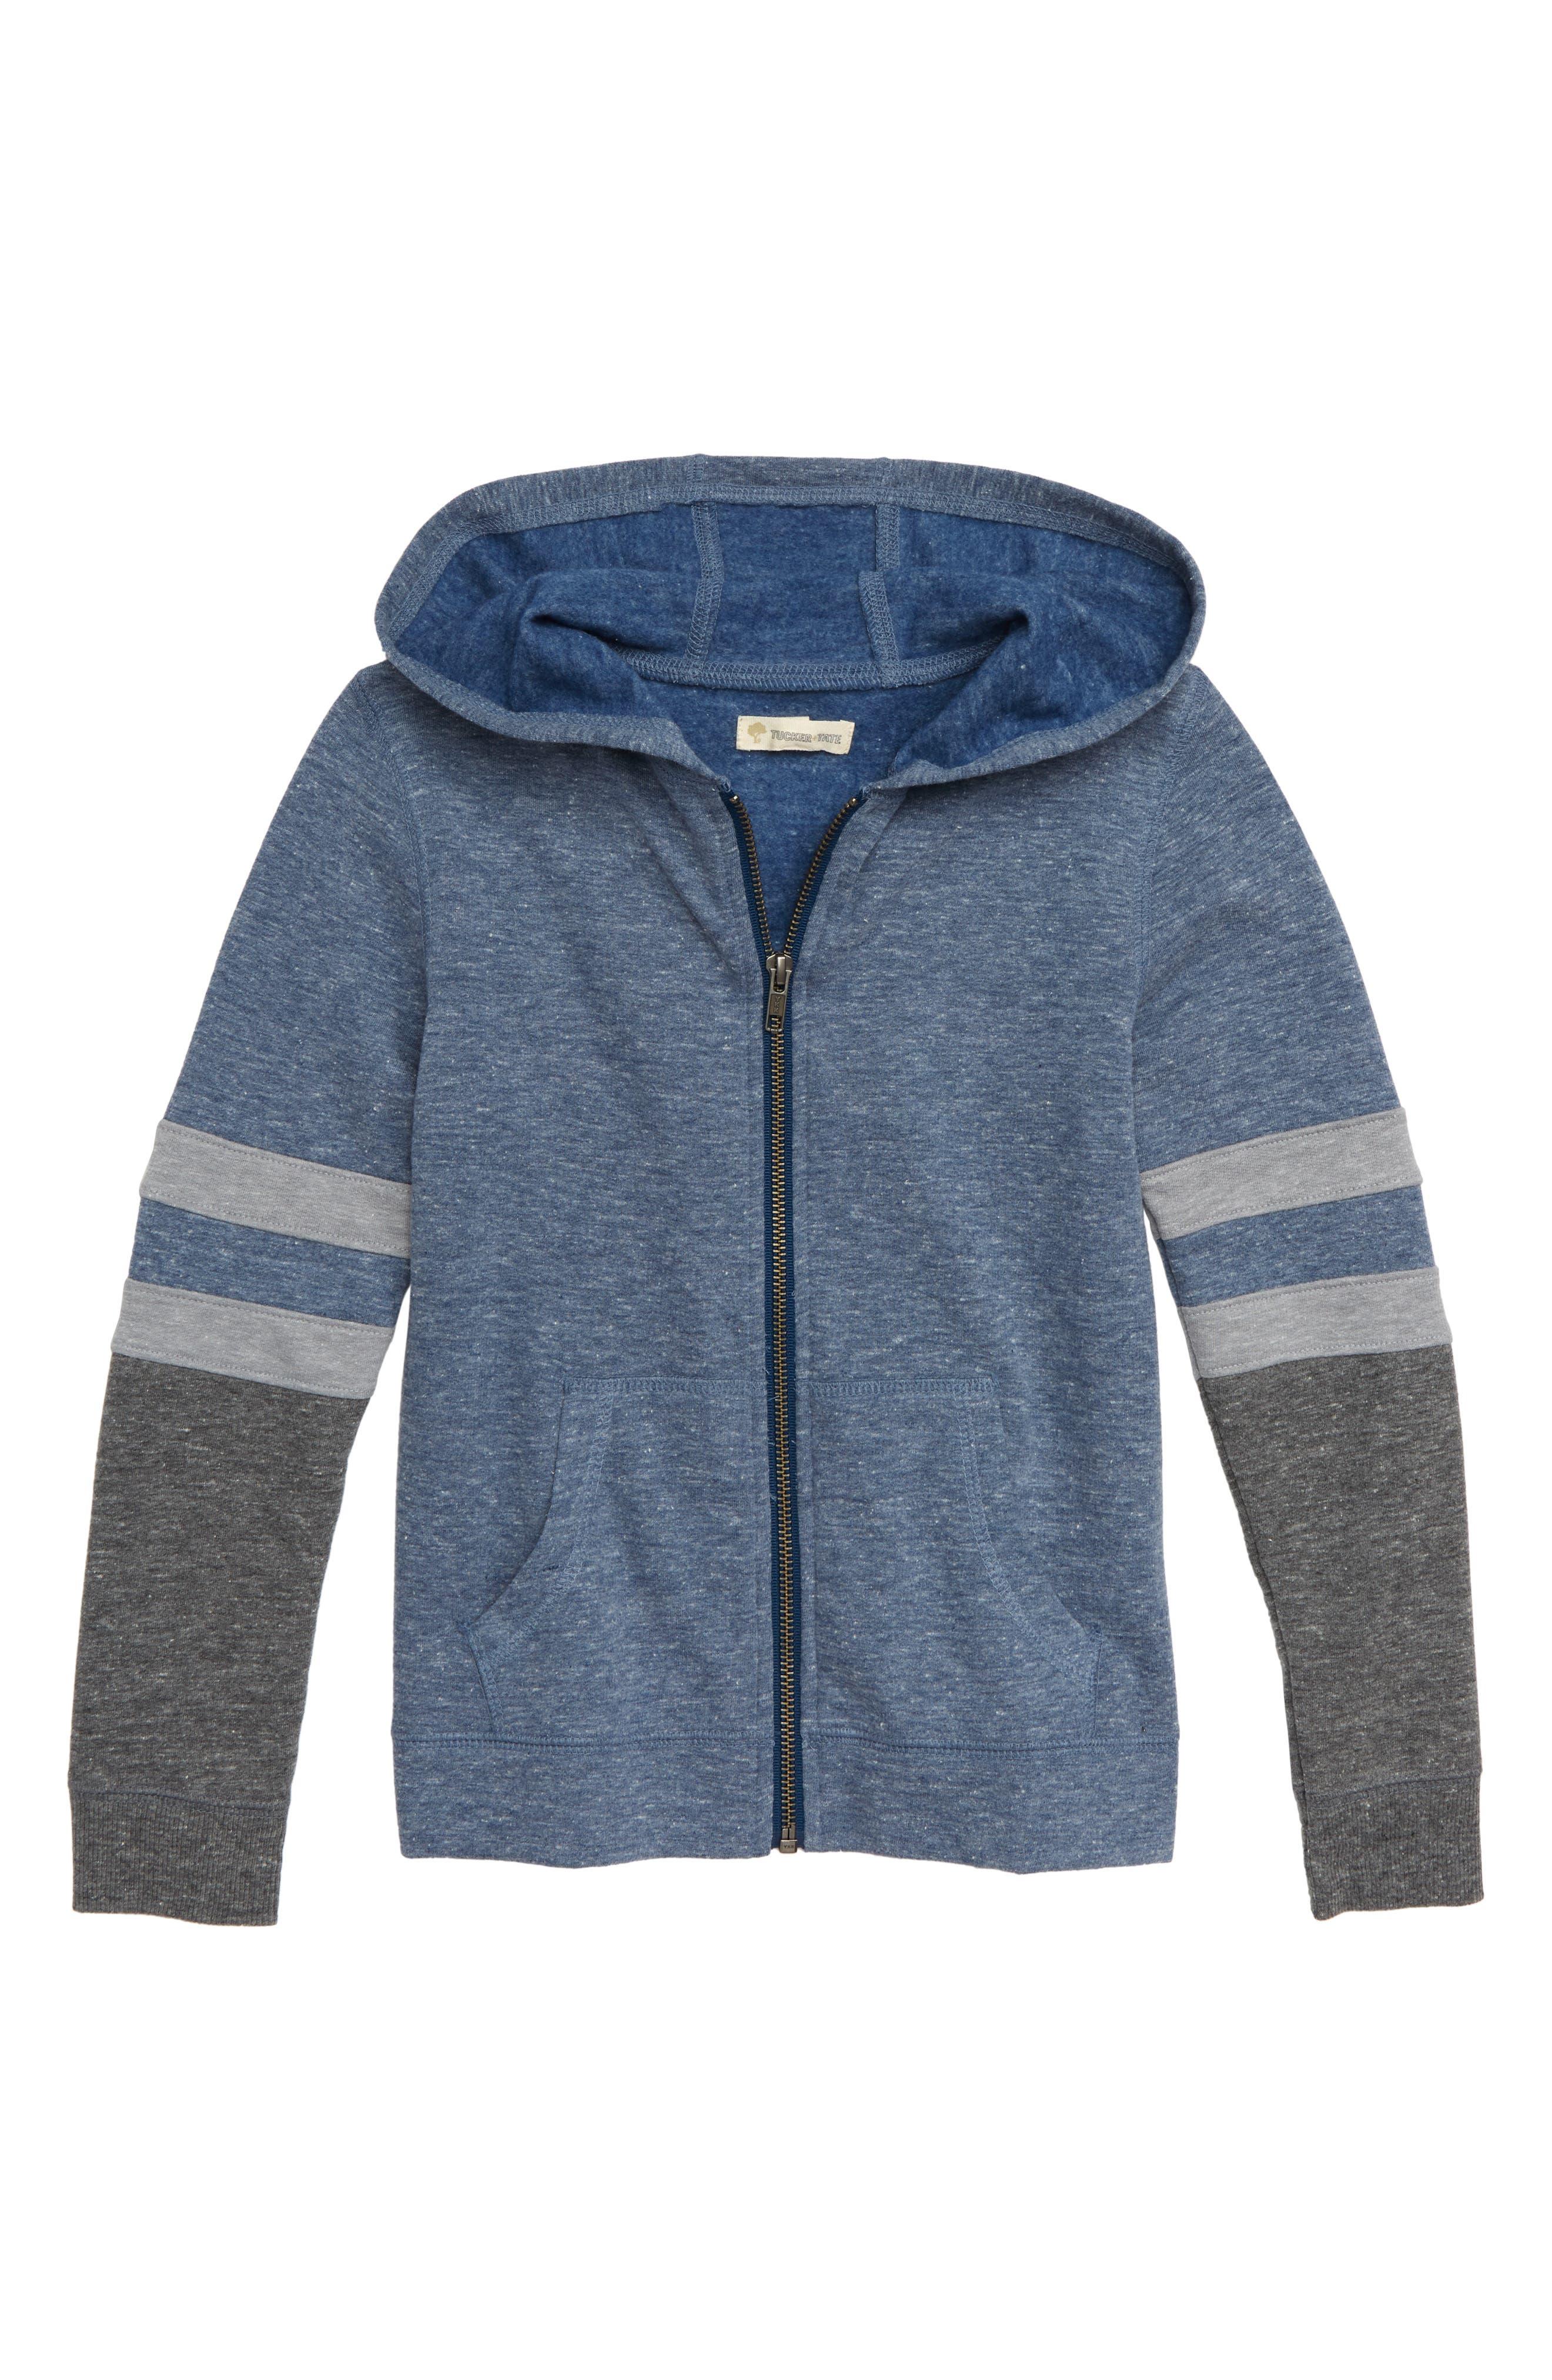 Colorblock Zip Crew Sweatshirt,                             Main thumbnail 1, color,                             401